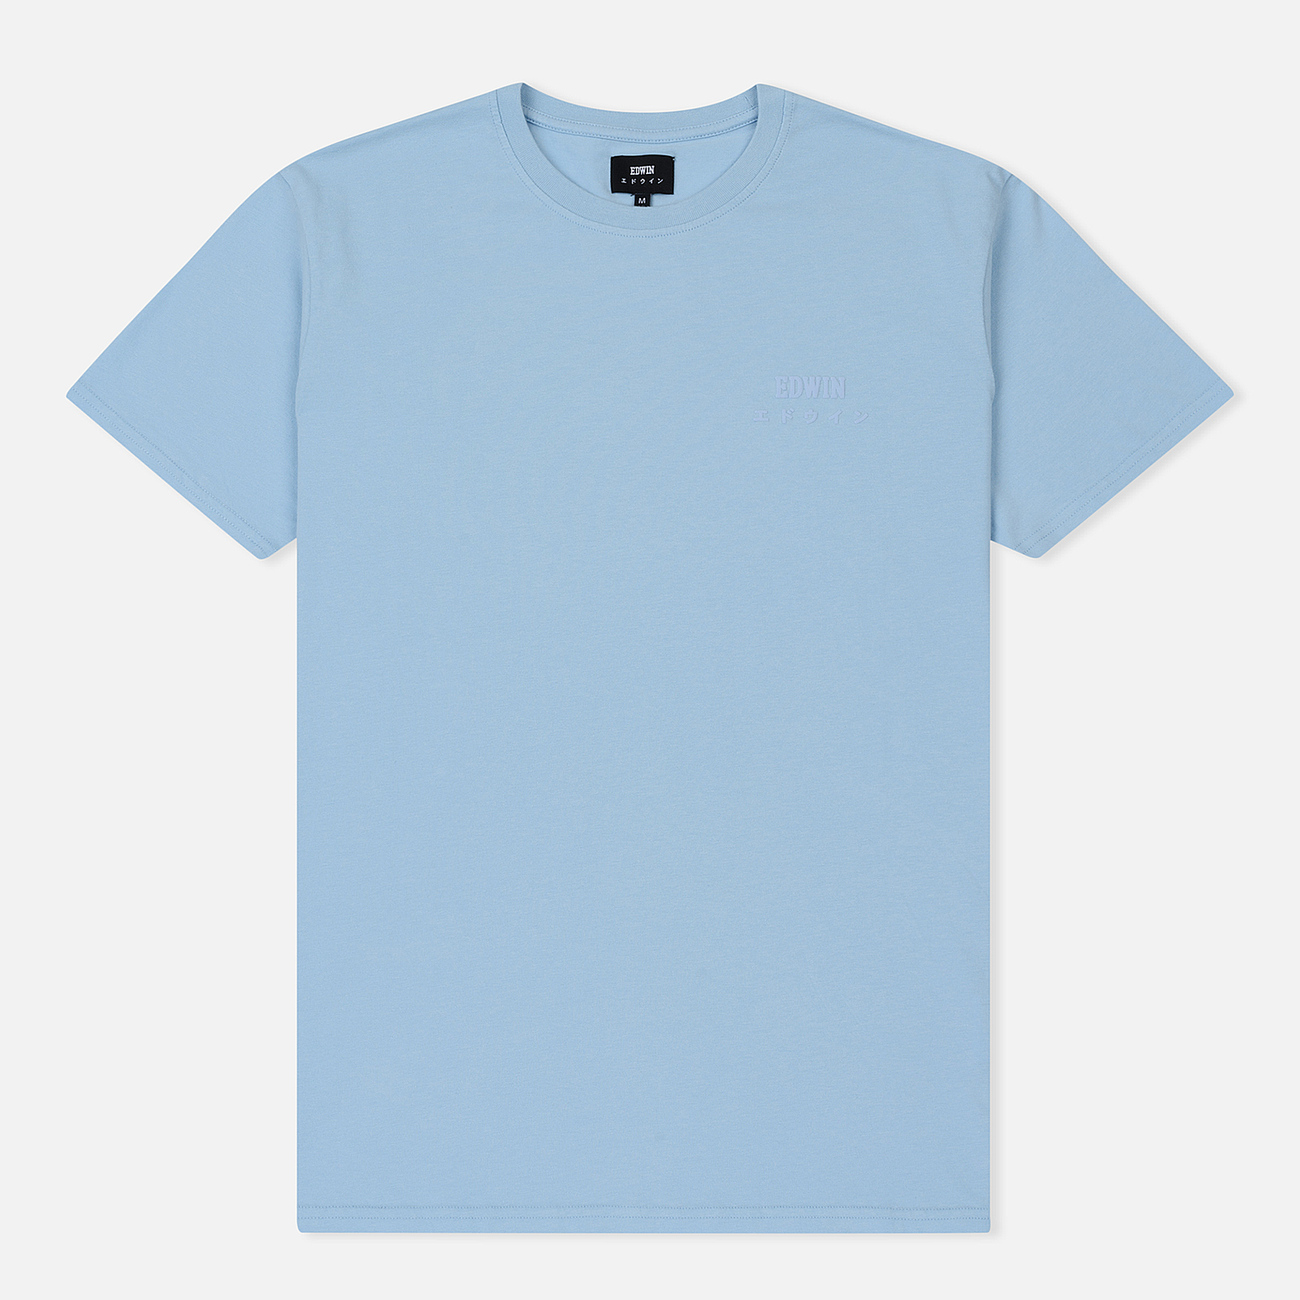 Мужская футболка Edwin Edwin Logo Chest Coole Blue Garment Washed